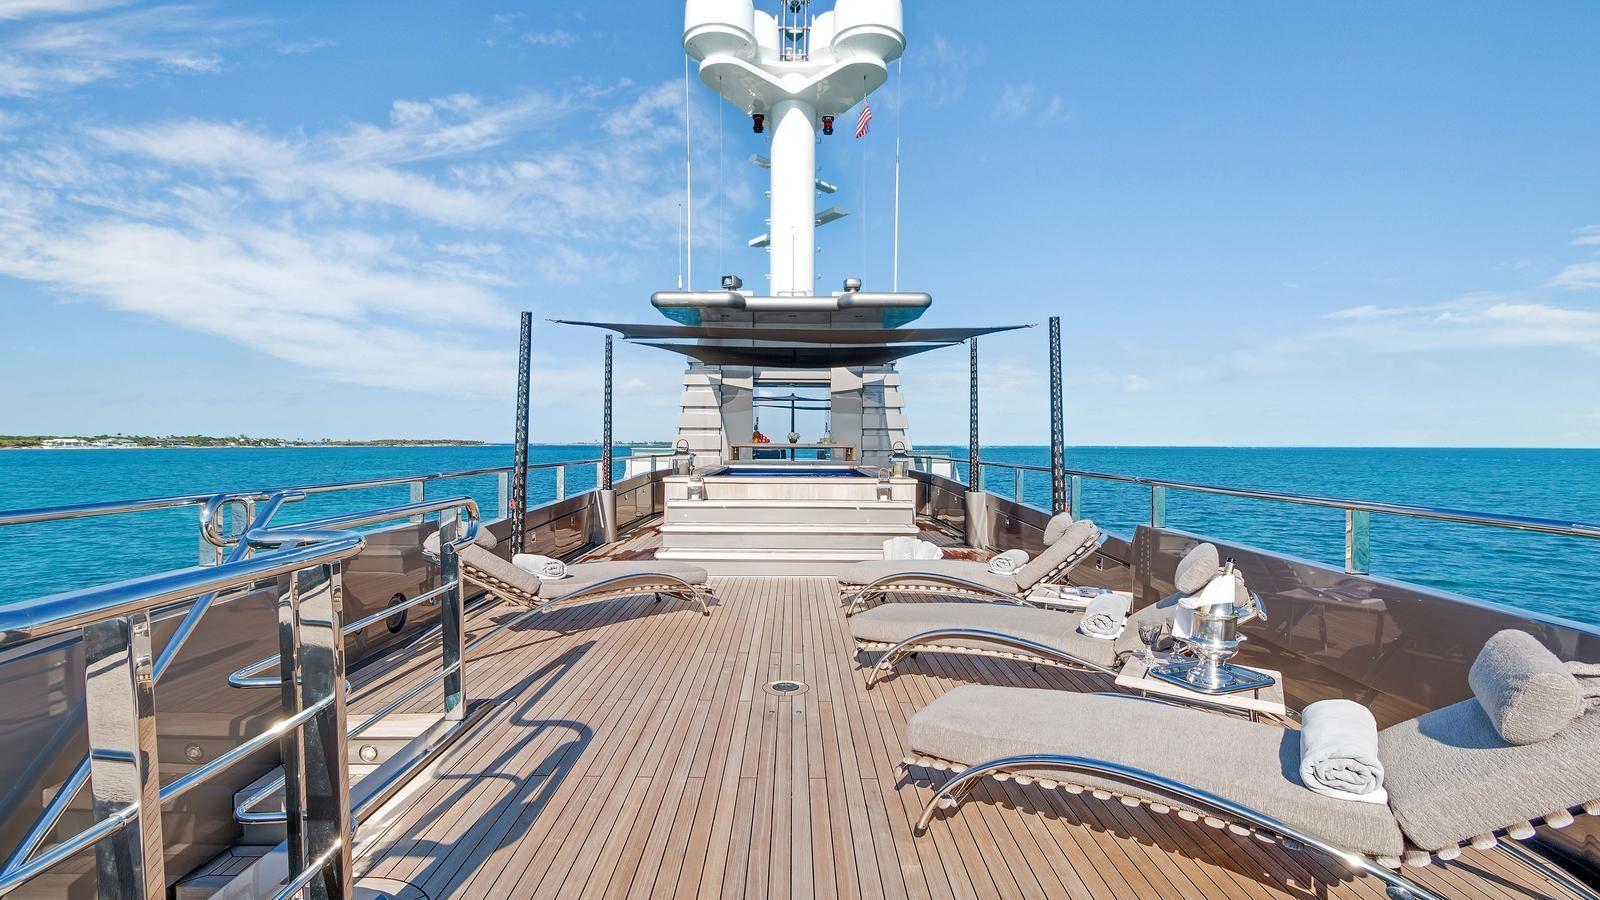 Jacuzzi Deck Jacuzziforsale Luxury Yachts For Sale Jacuzzi Yacht For Sale